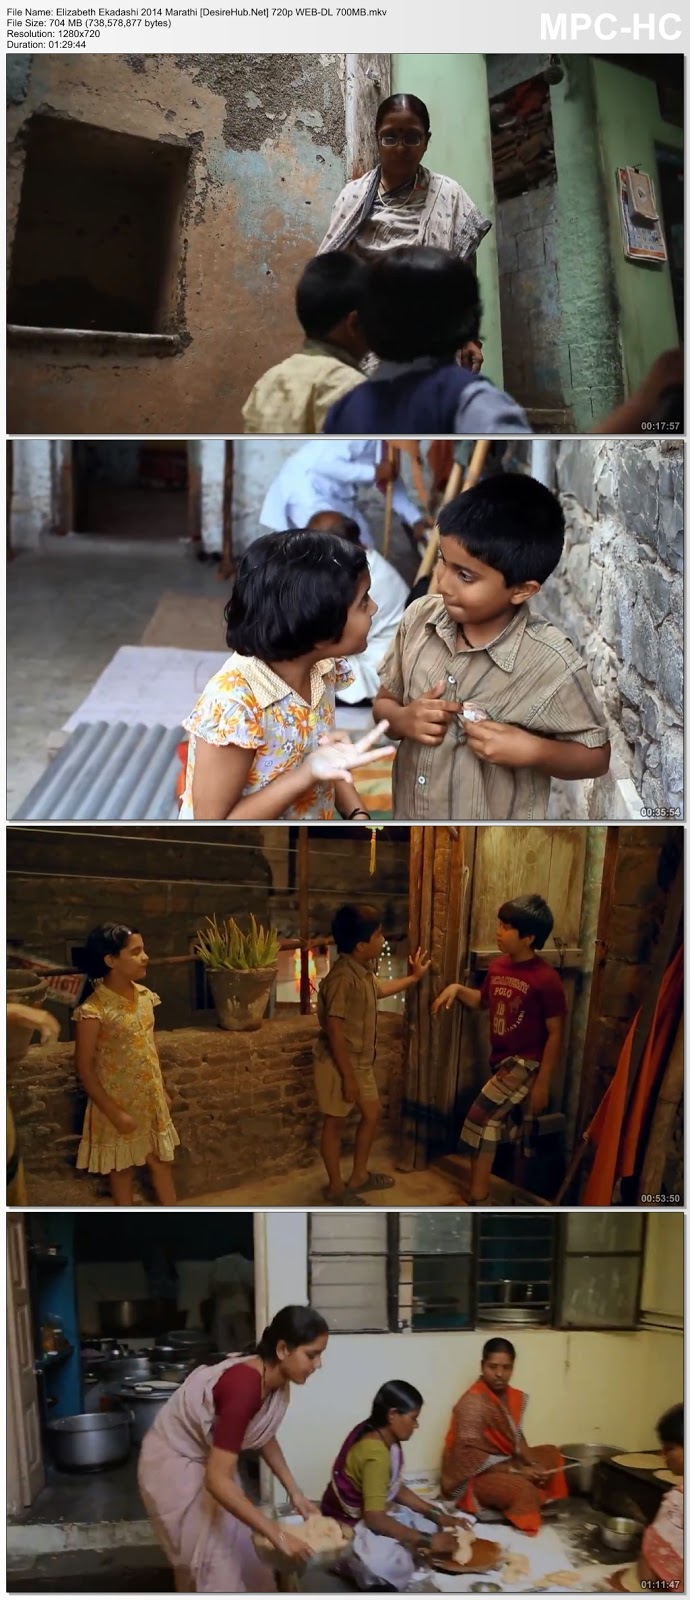 Elizabeth Ekadashi 2014 Marathi 720p WEB-DL 700MB Desirehub